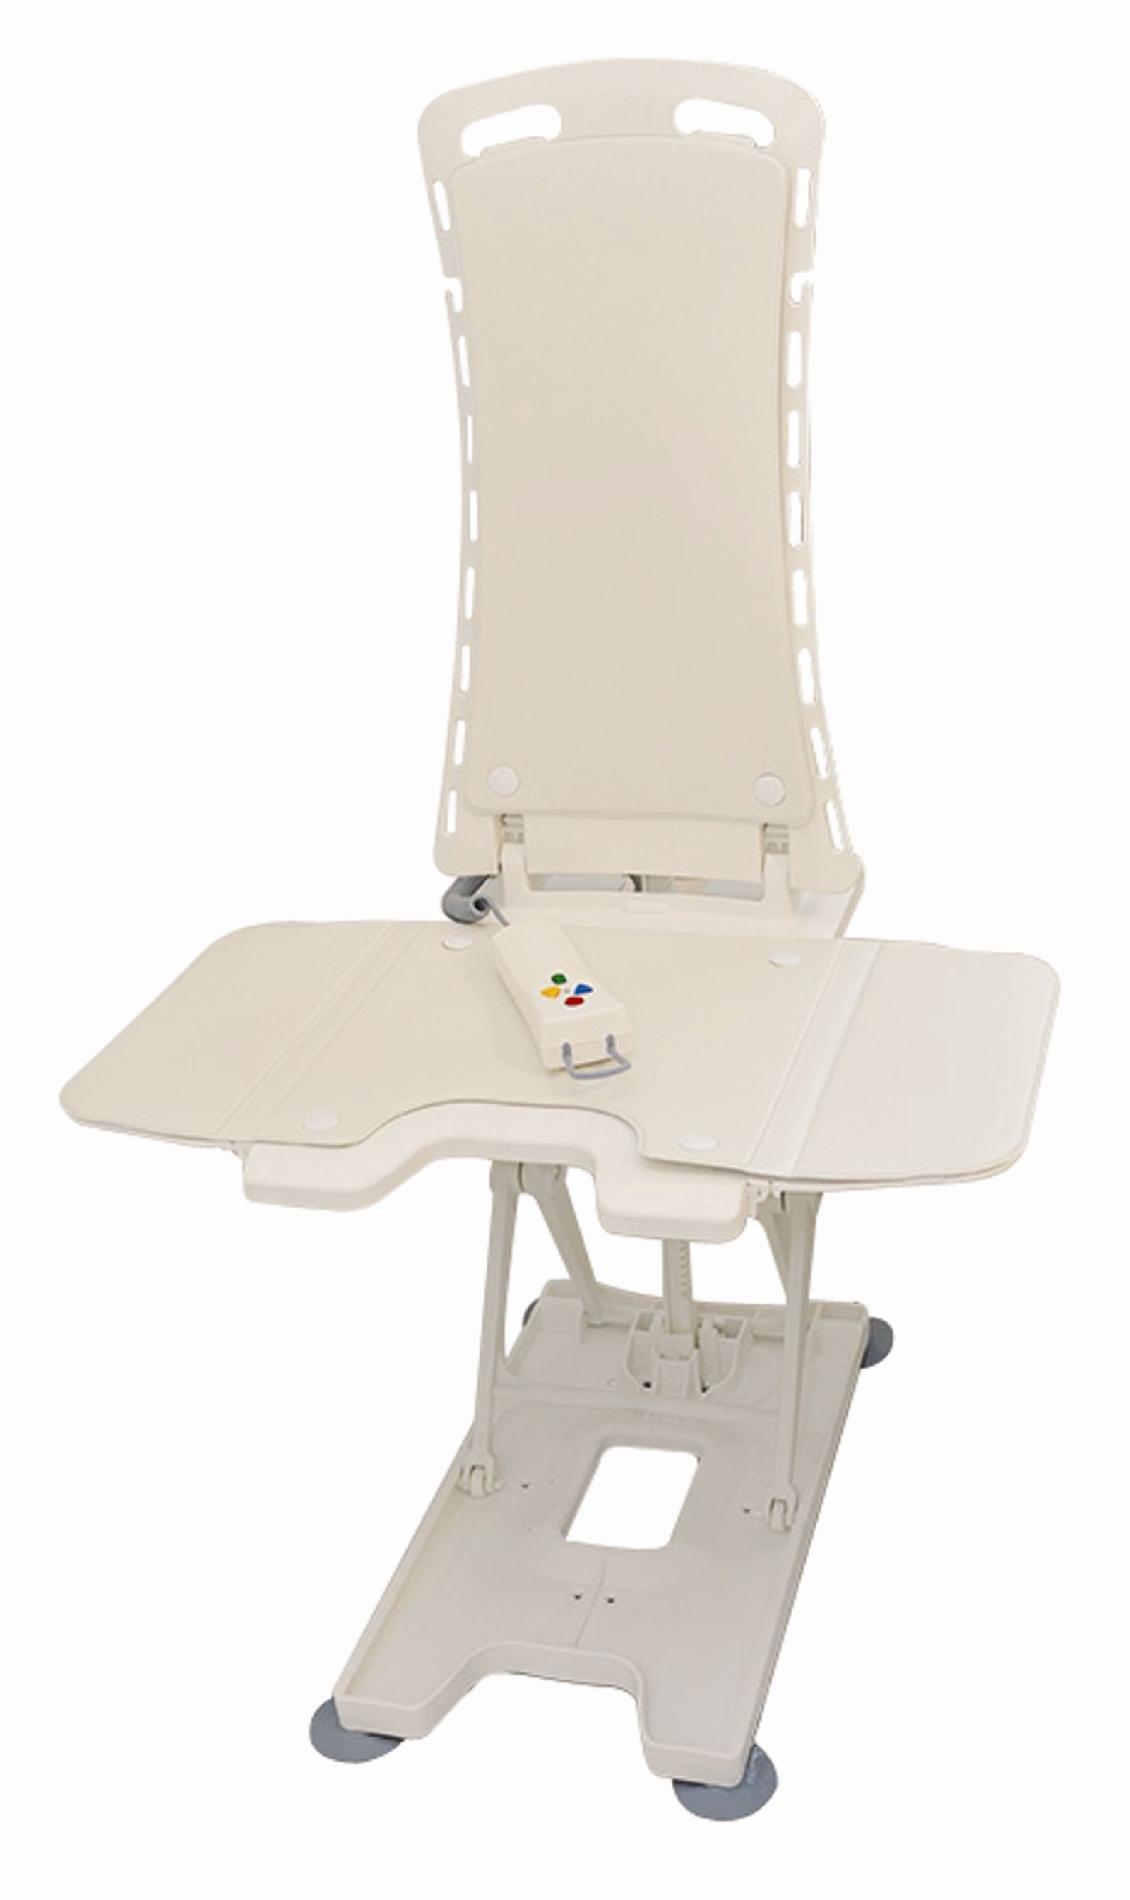 medical chair lift small stool drive bellavita auto bath tub seat